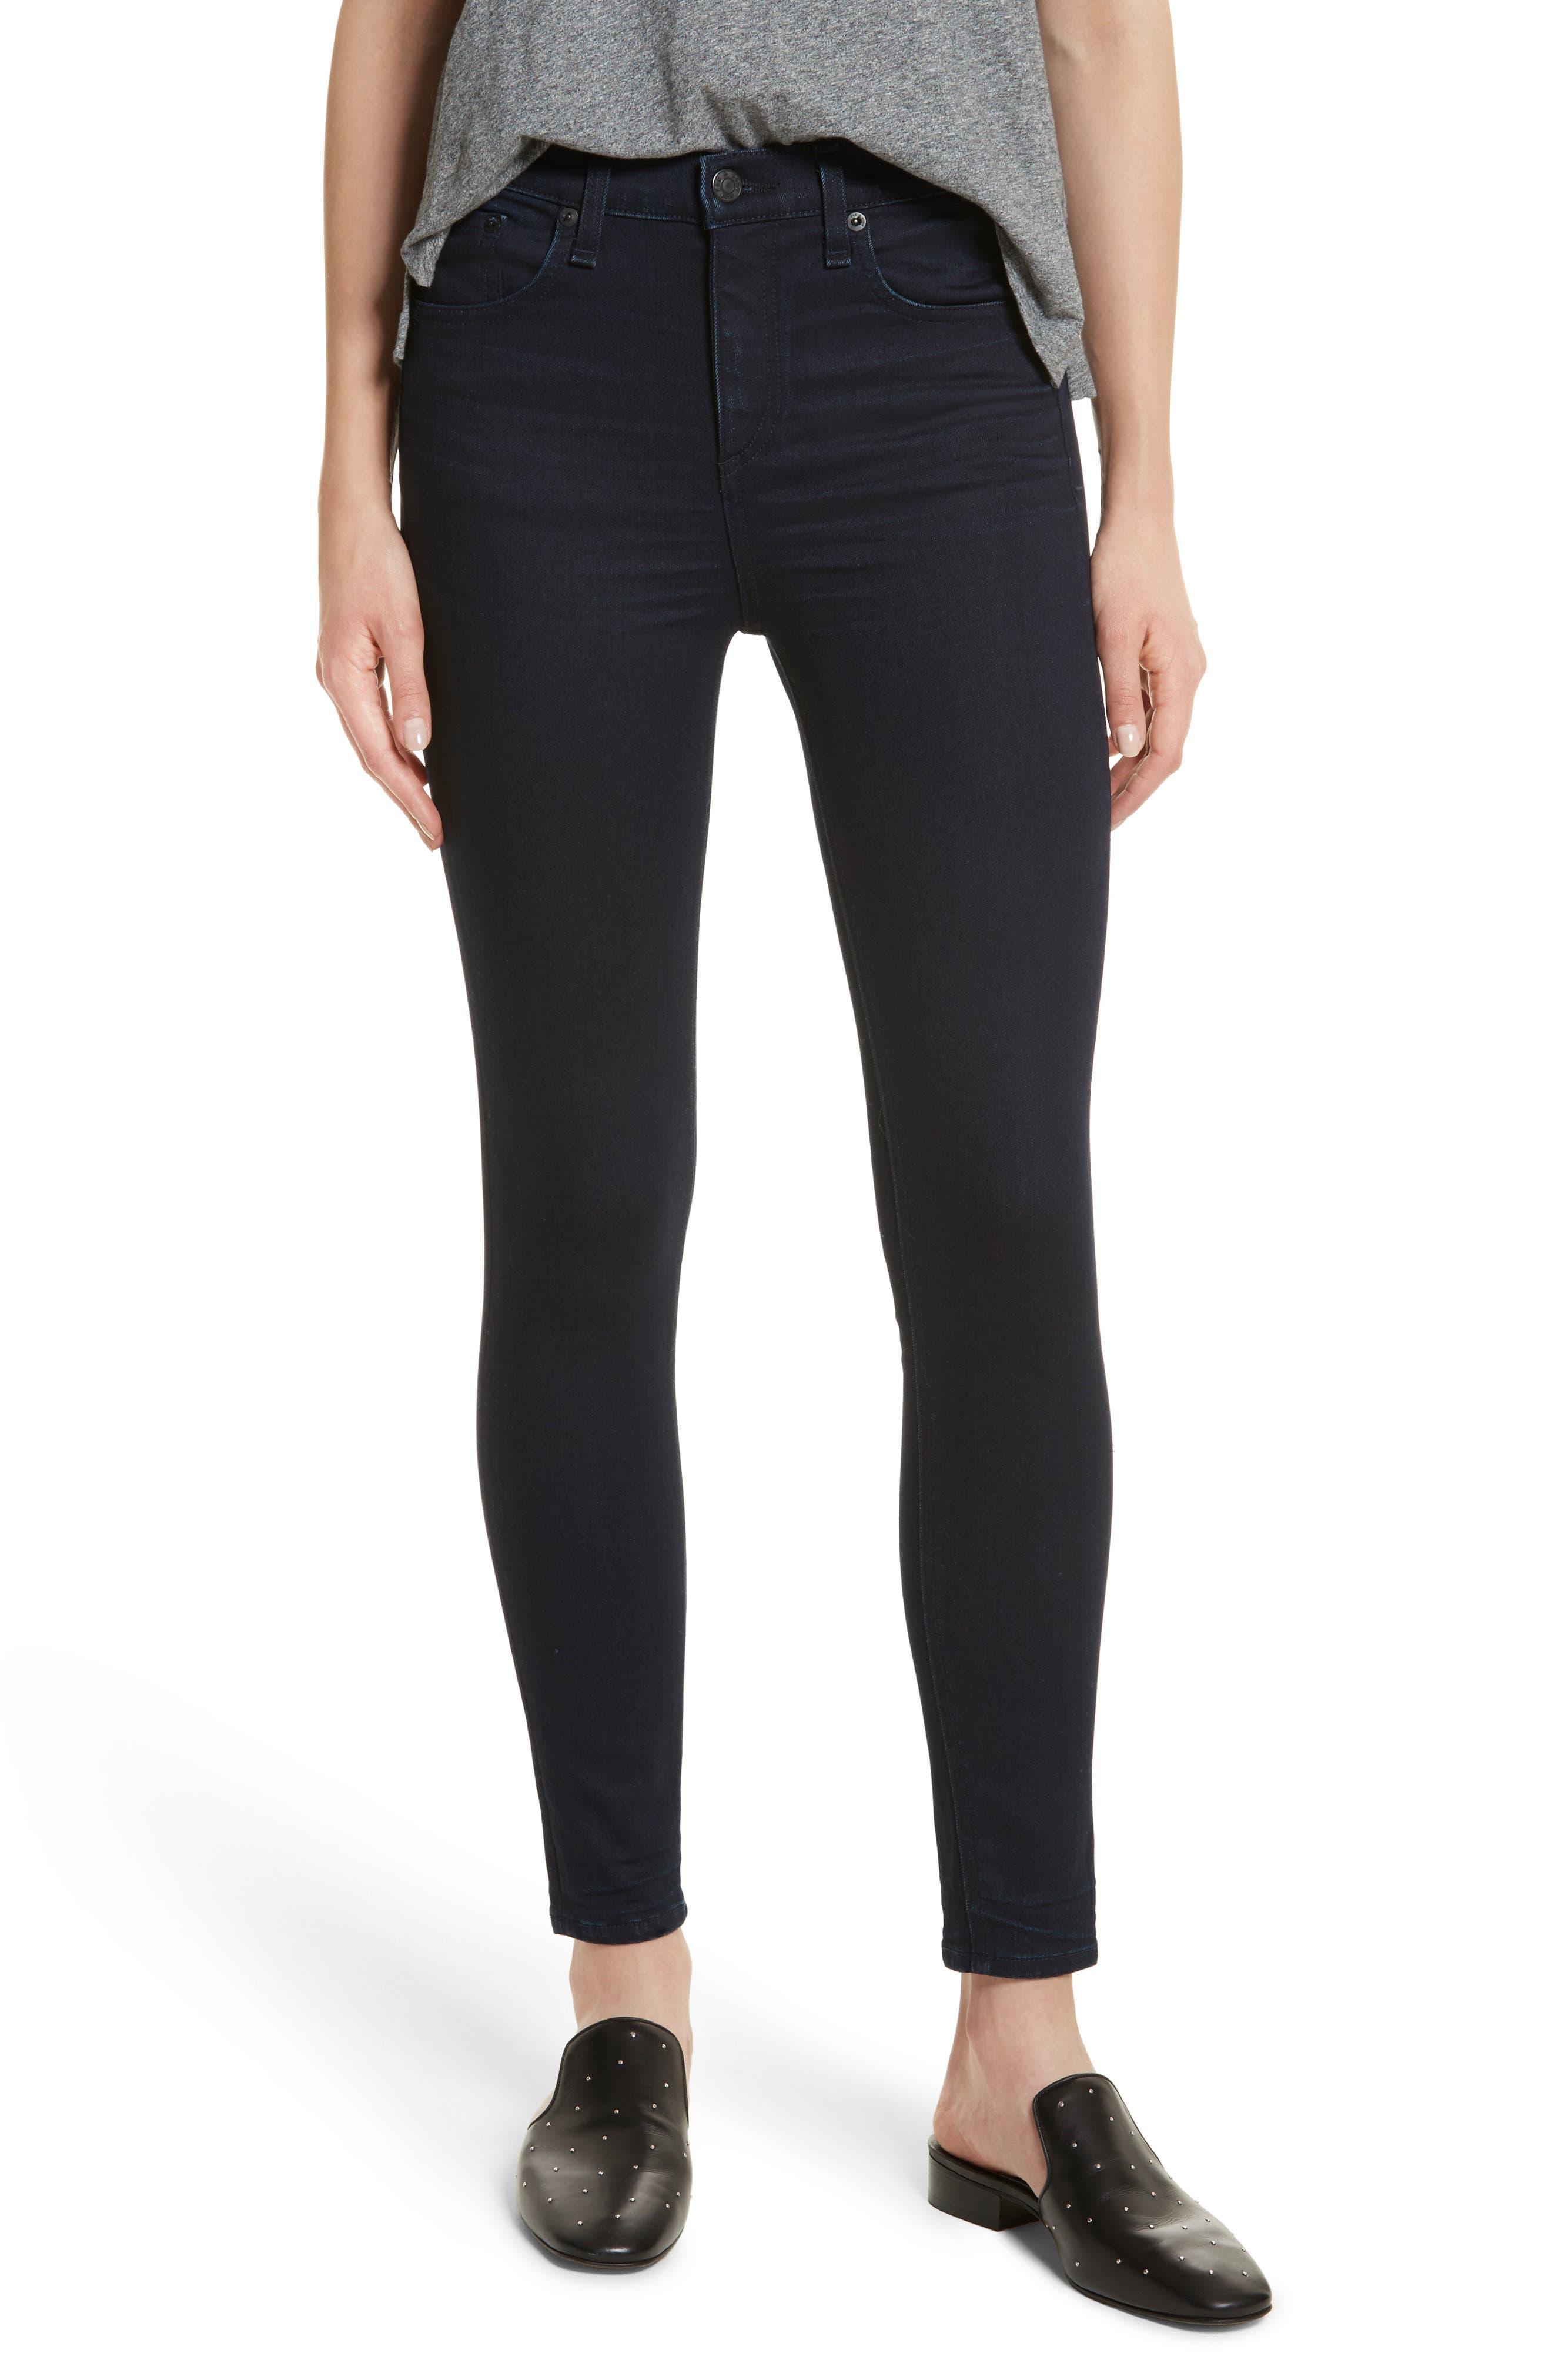 RAG & BONE,                             JEAN High Waist Ankle Skinny Jeans,                             Main thumbnail 1, color,                             001